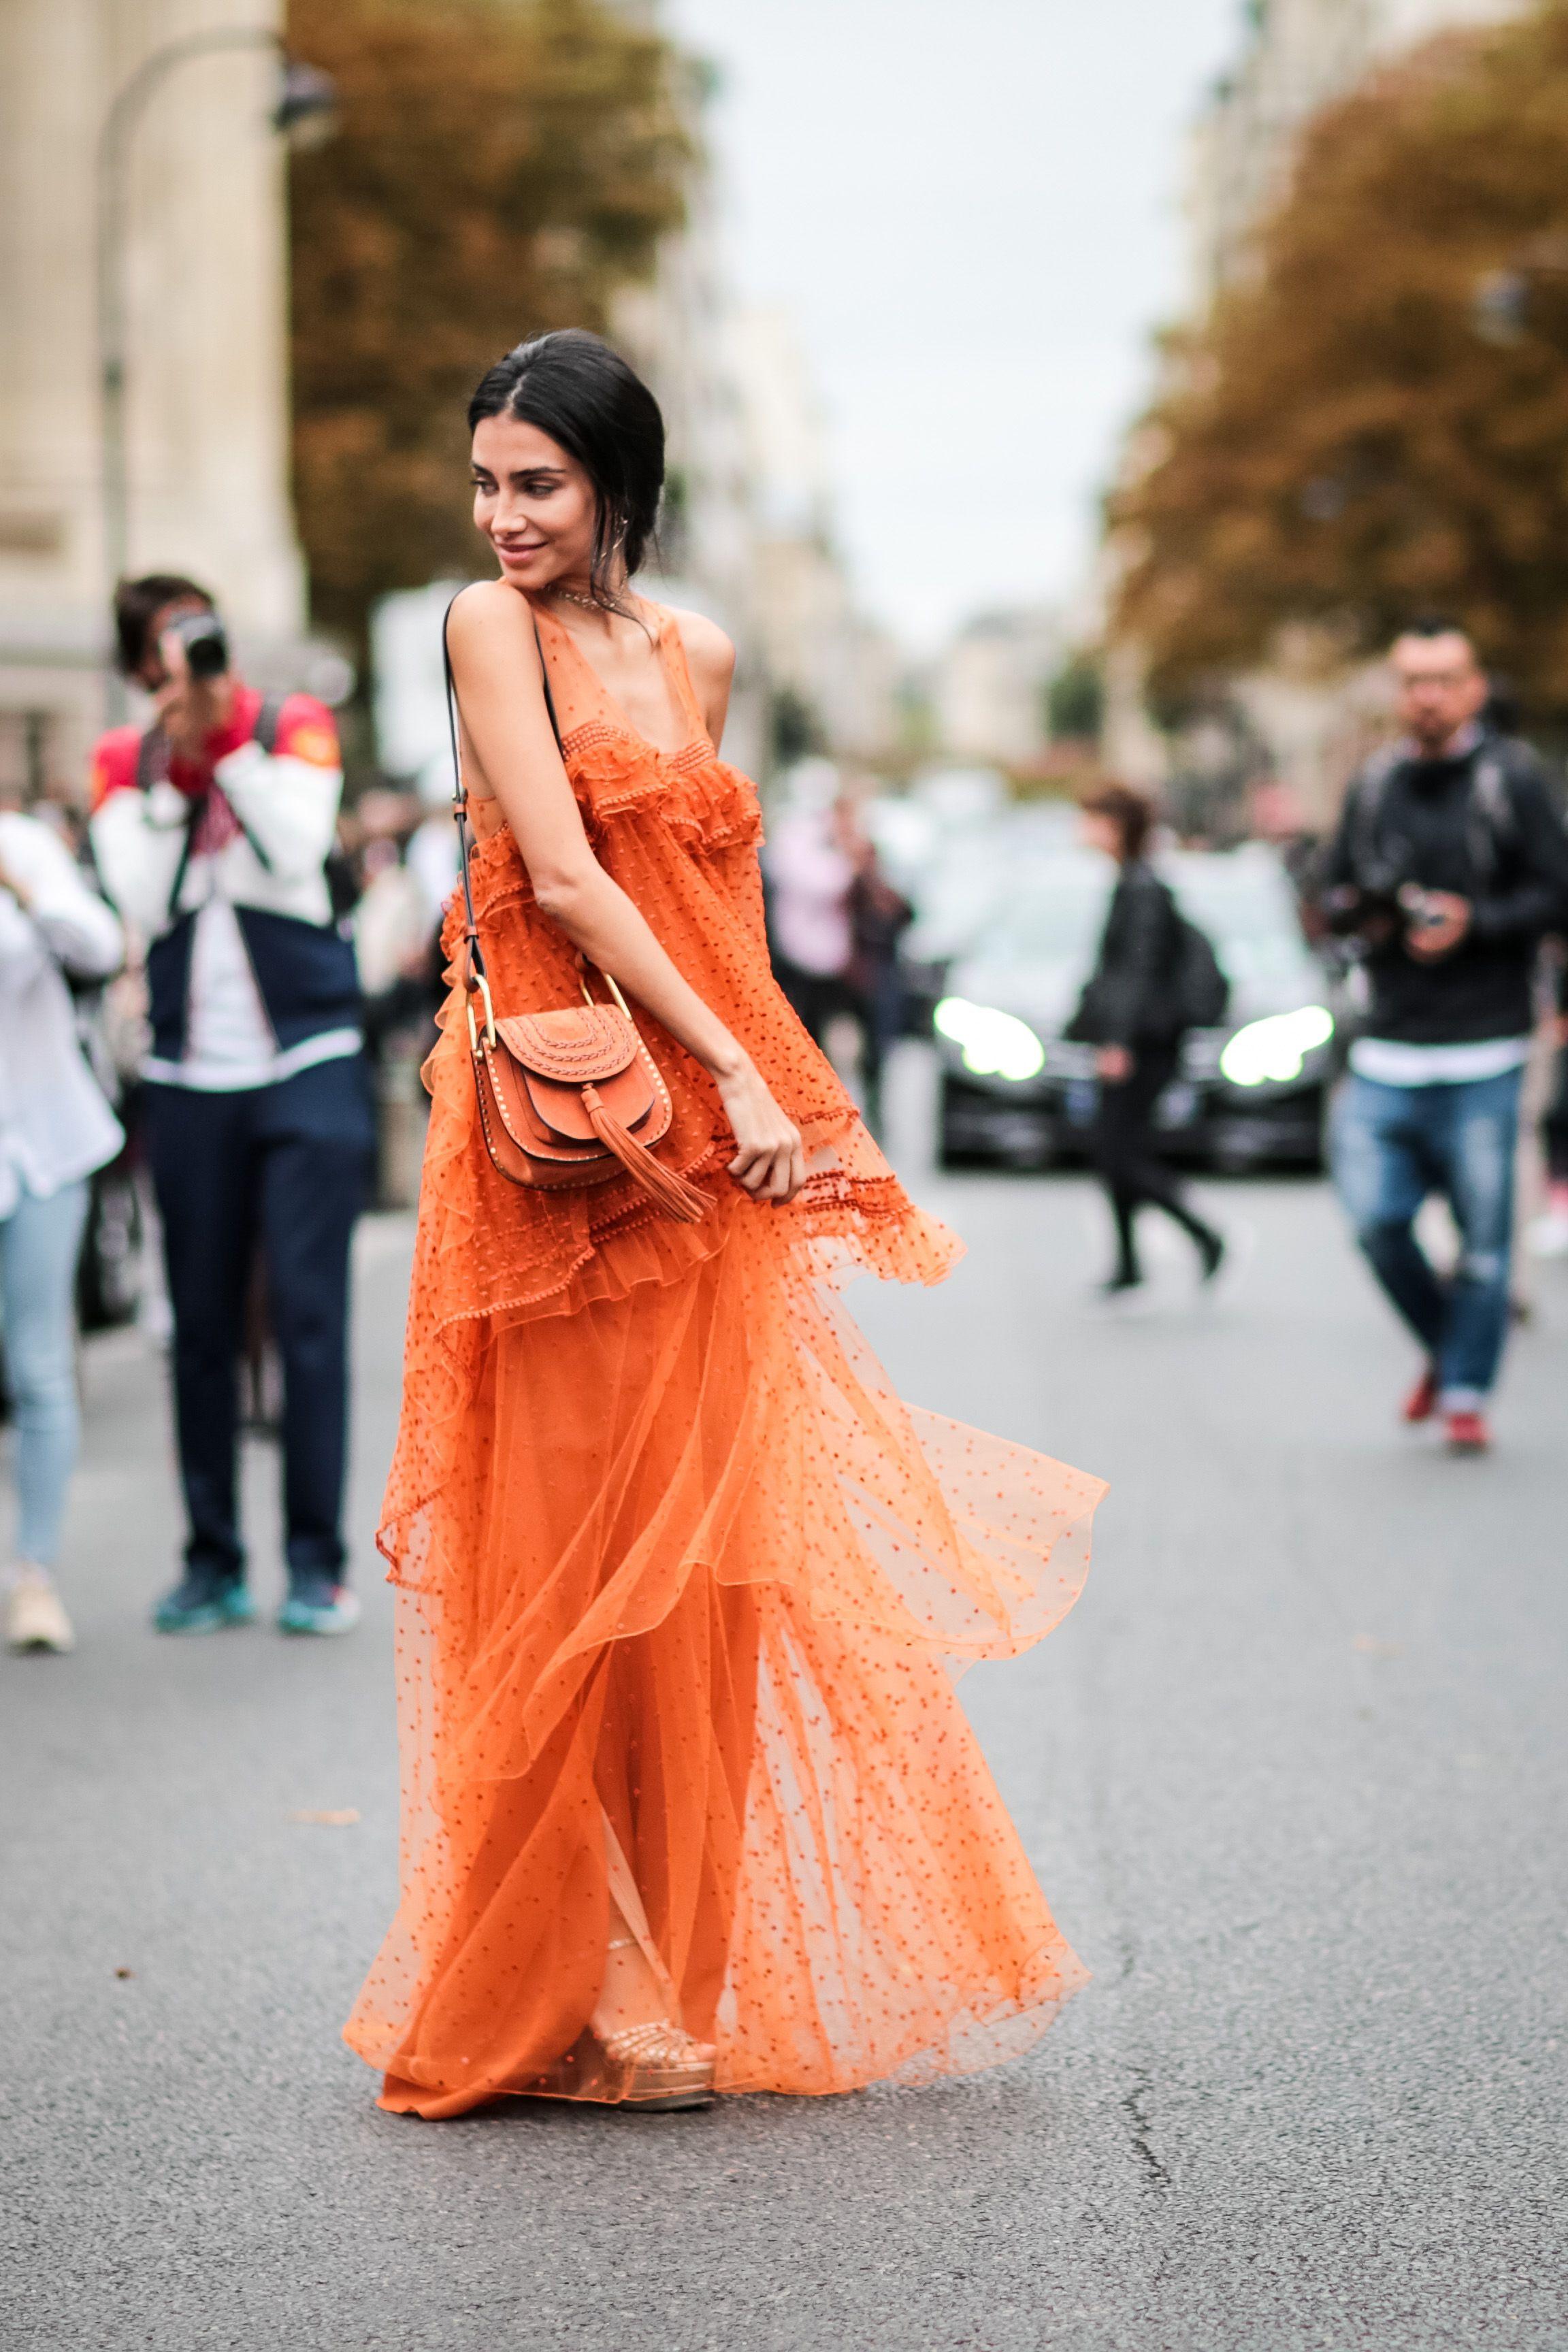 Paris Fashion Week SS17 Street Style Day 5